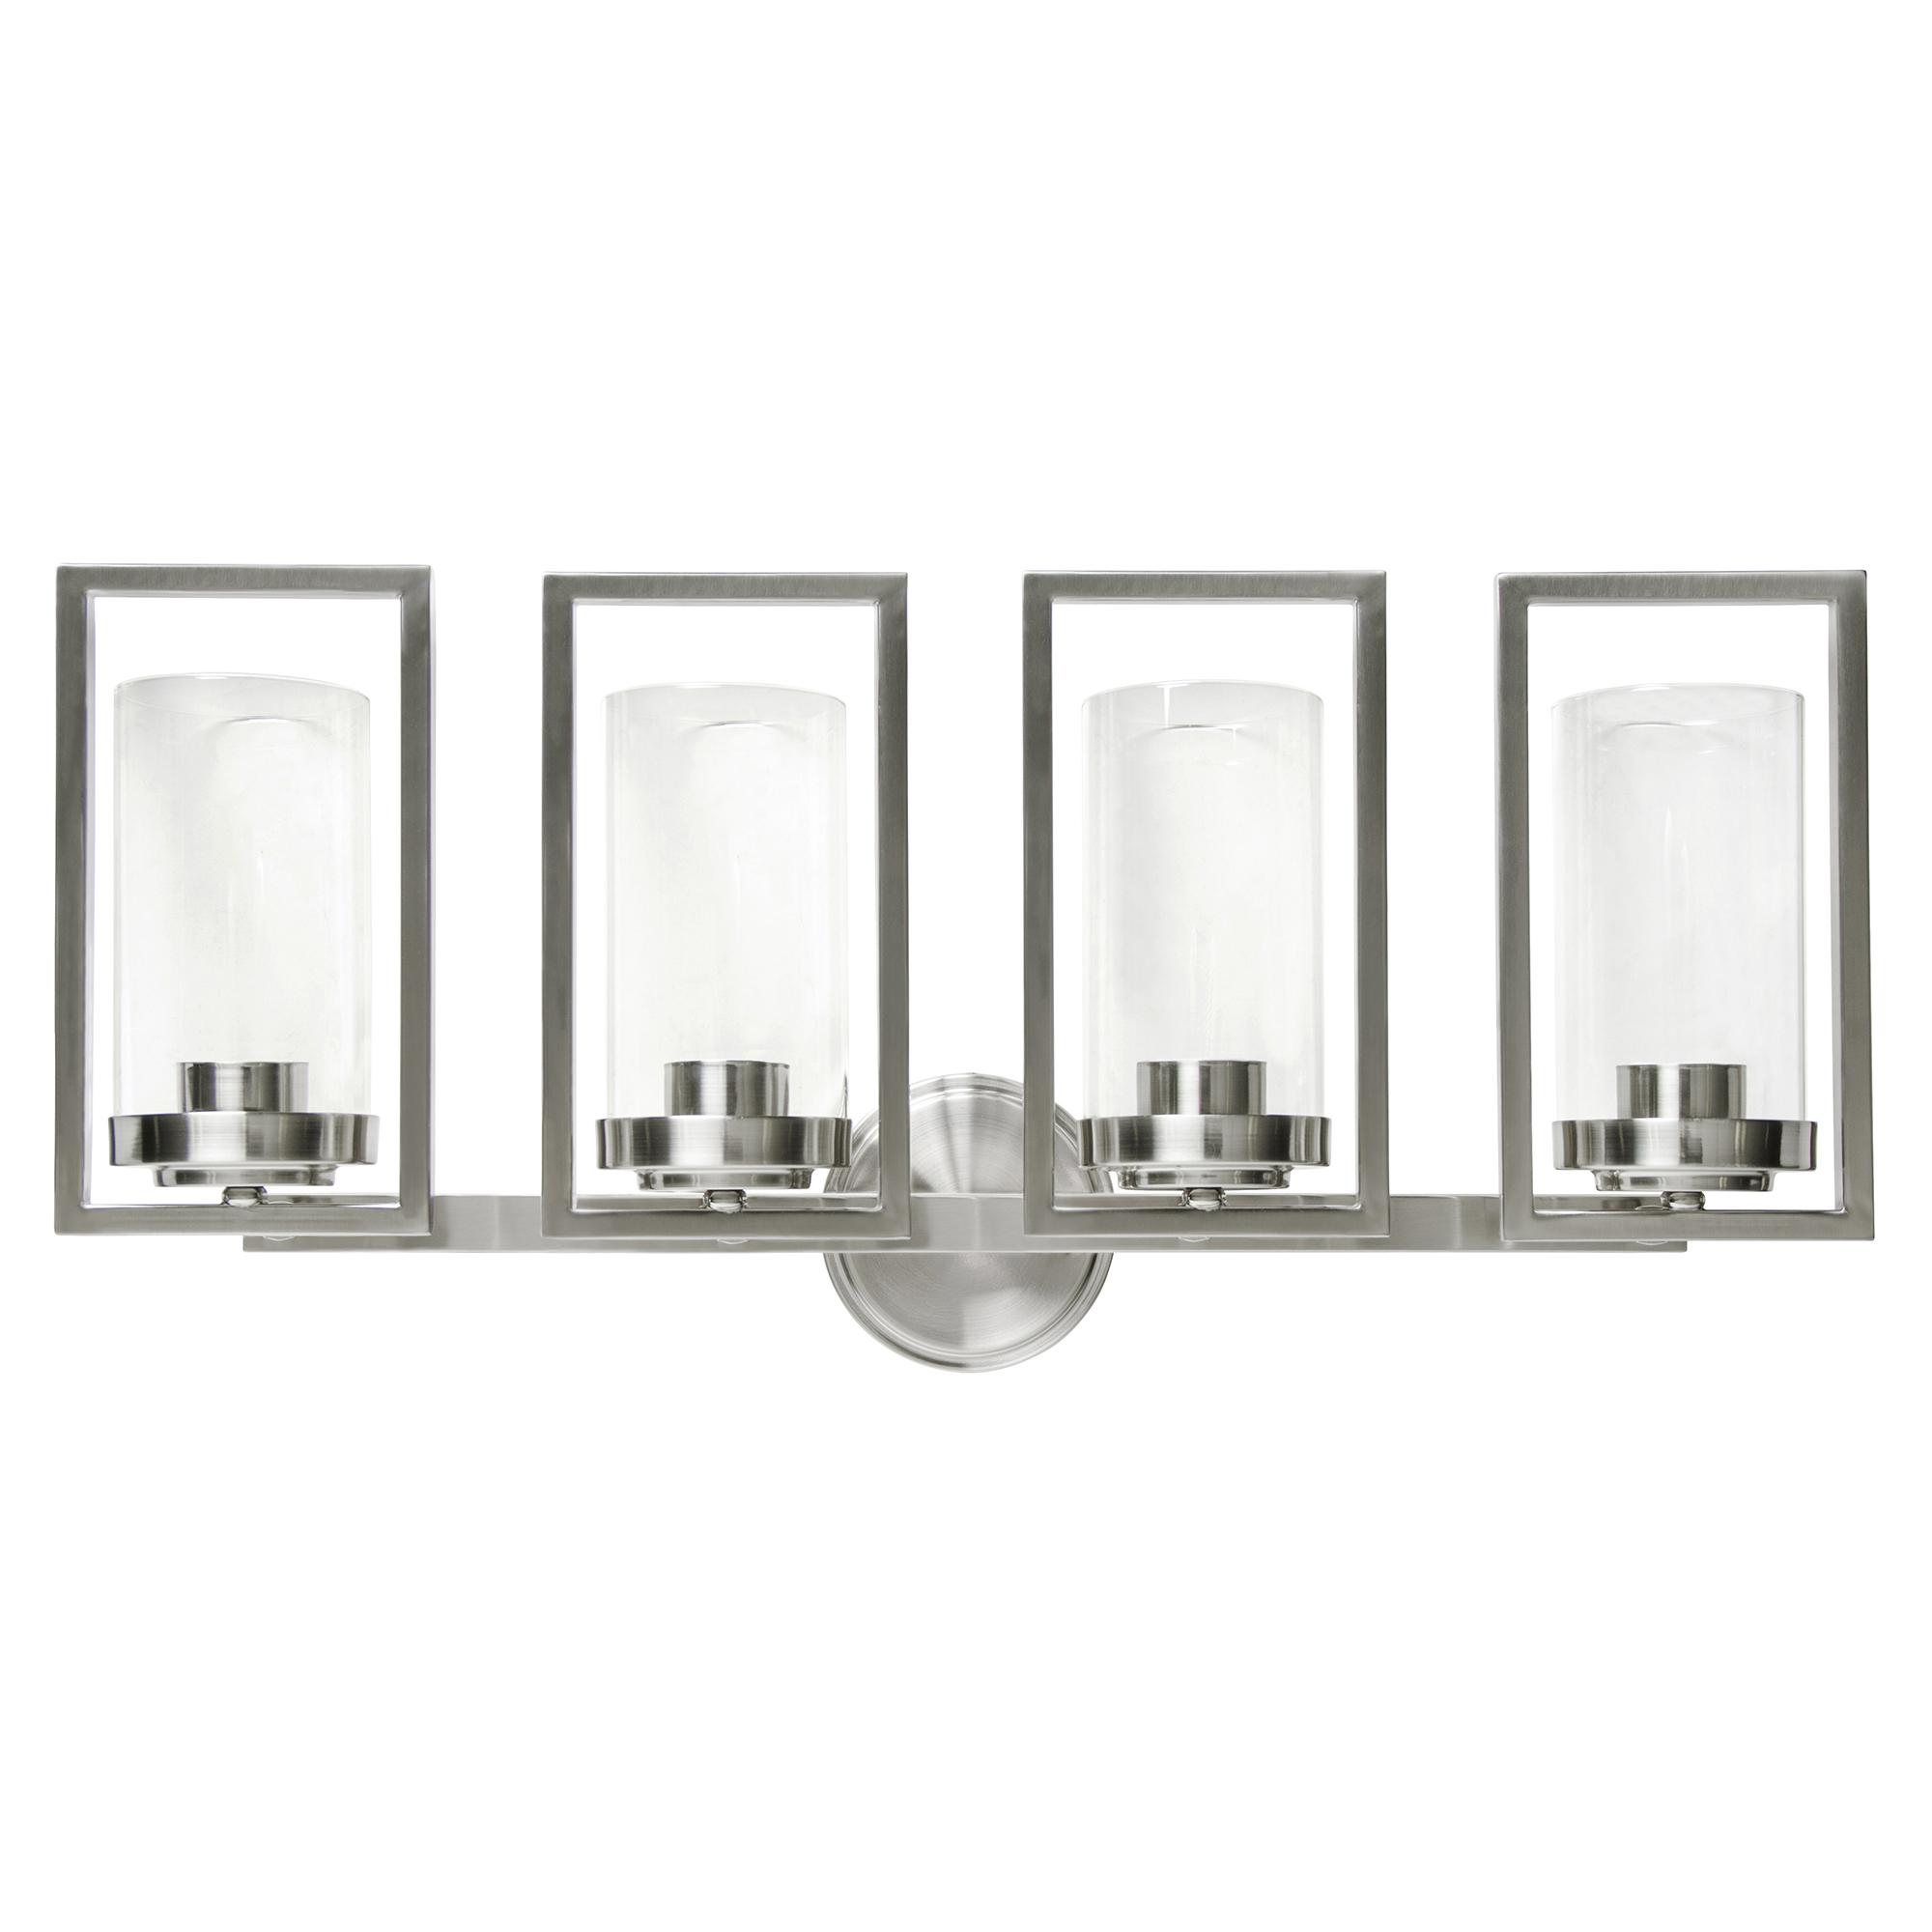 Sunset Lighting Prestige Four Light Wall Sconce - in Bright Satin Nickel, Glass, 4 Bulbs